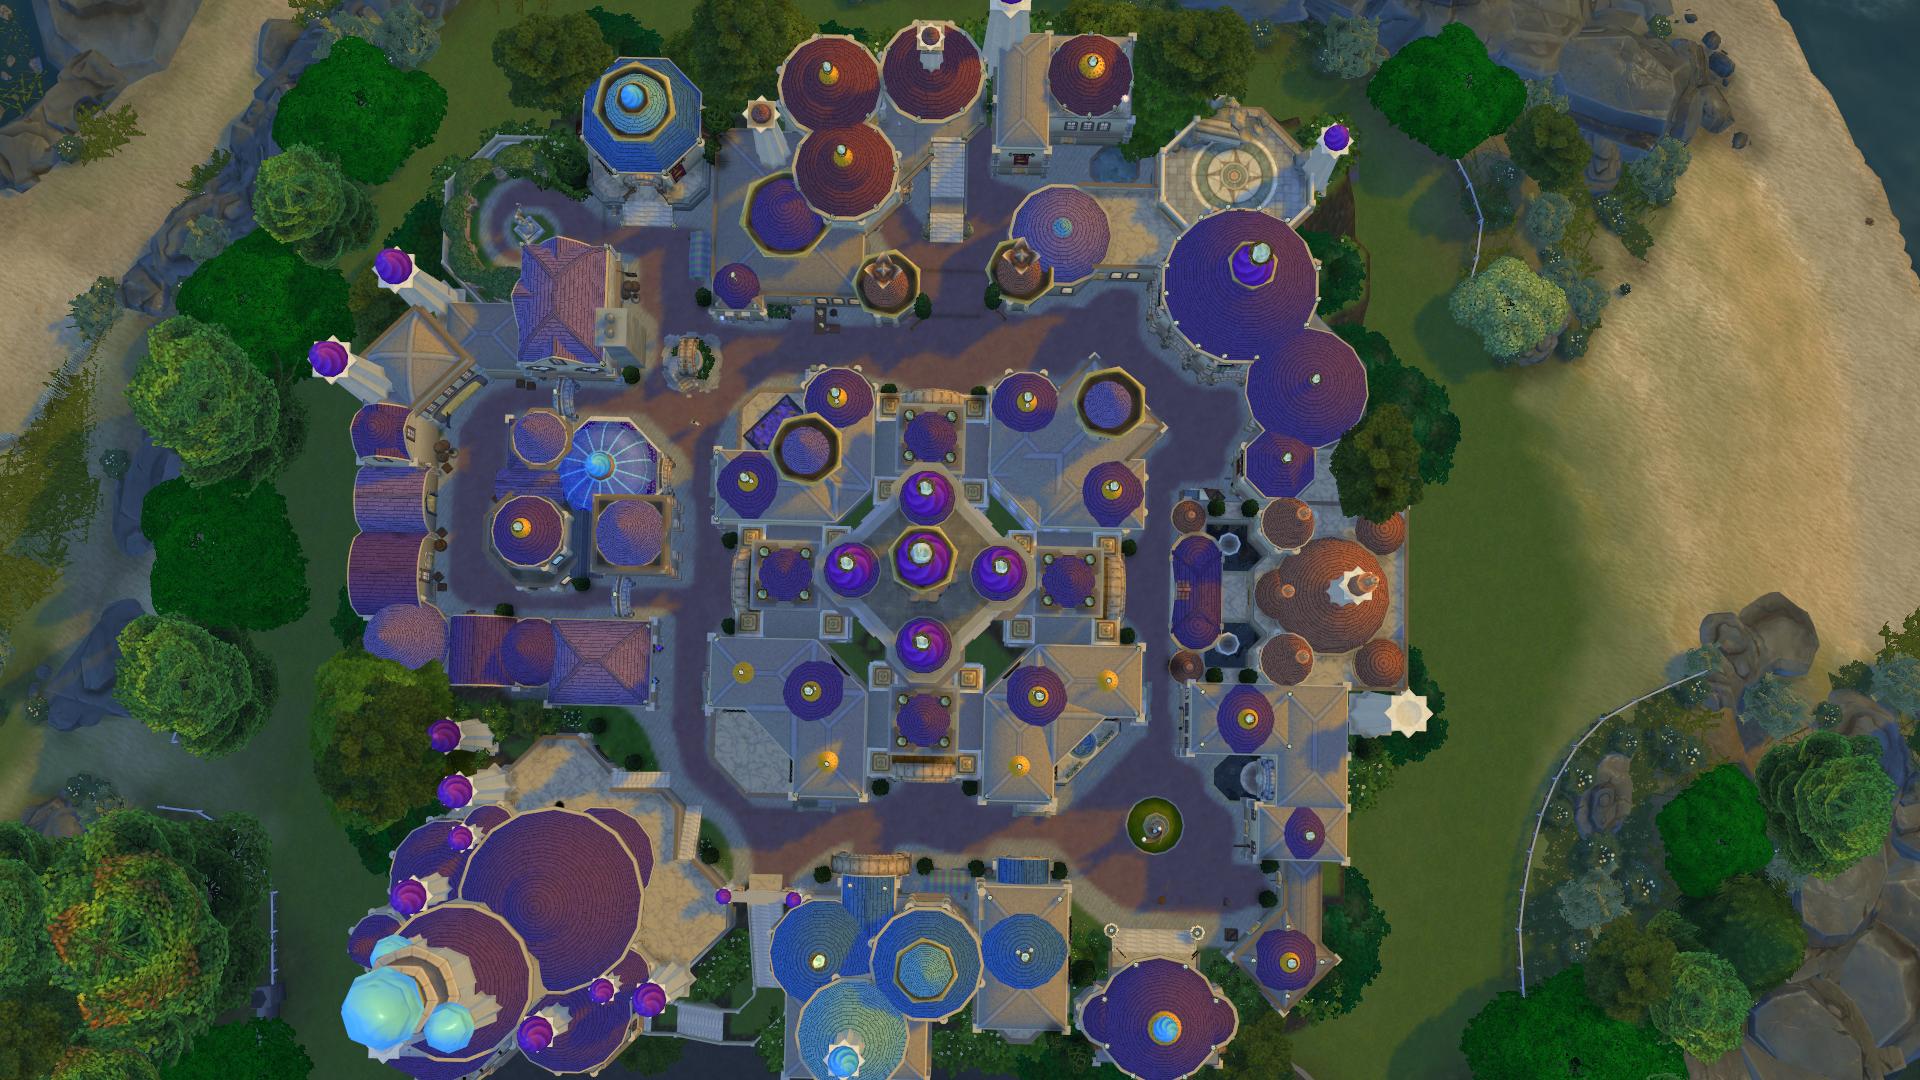 Mod The Sims - Dalaran || The Floating City Rebuilt In The